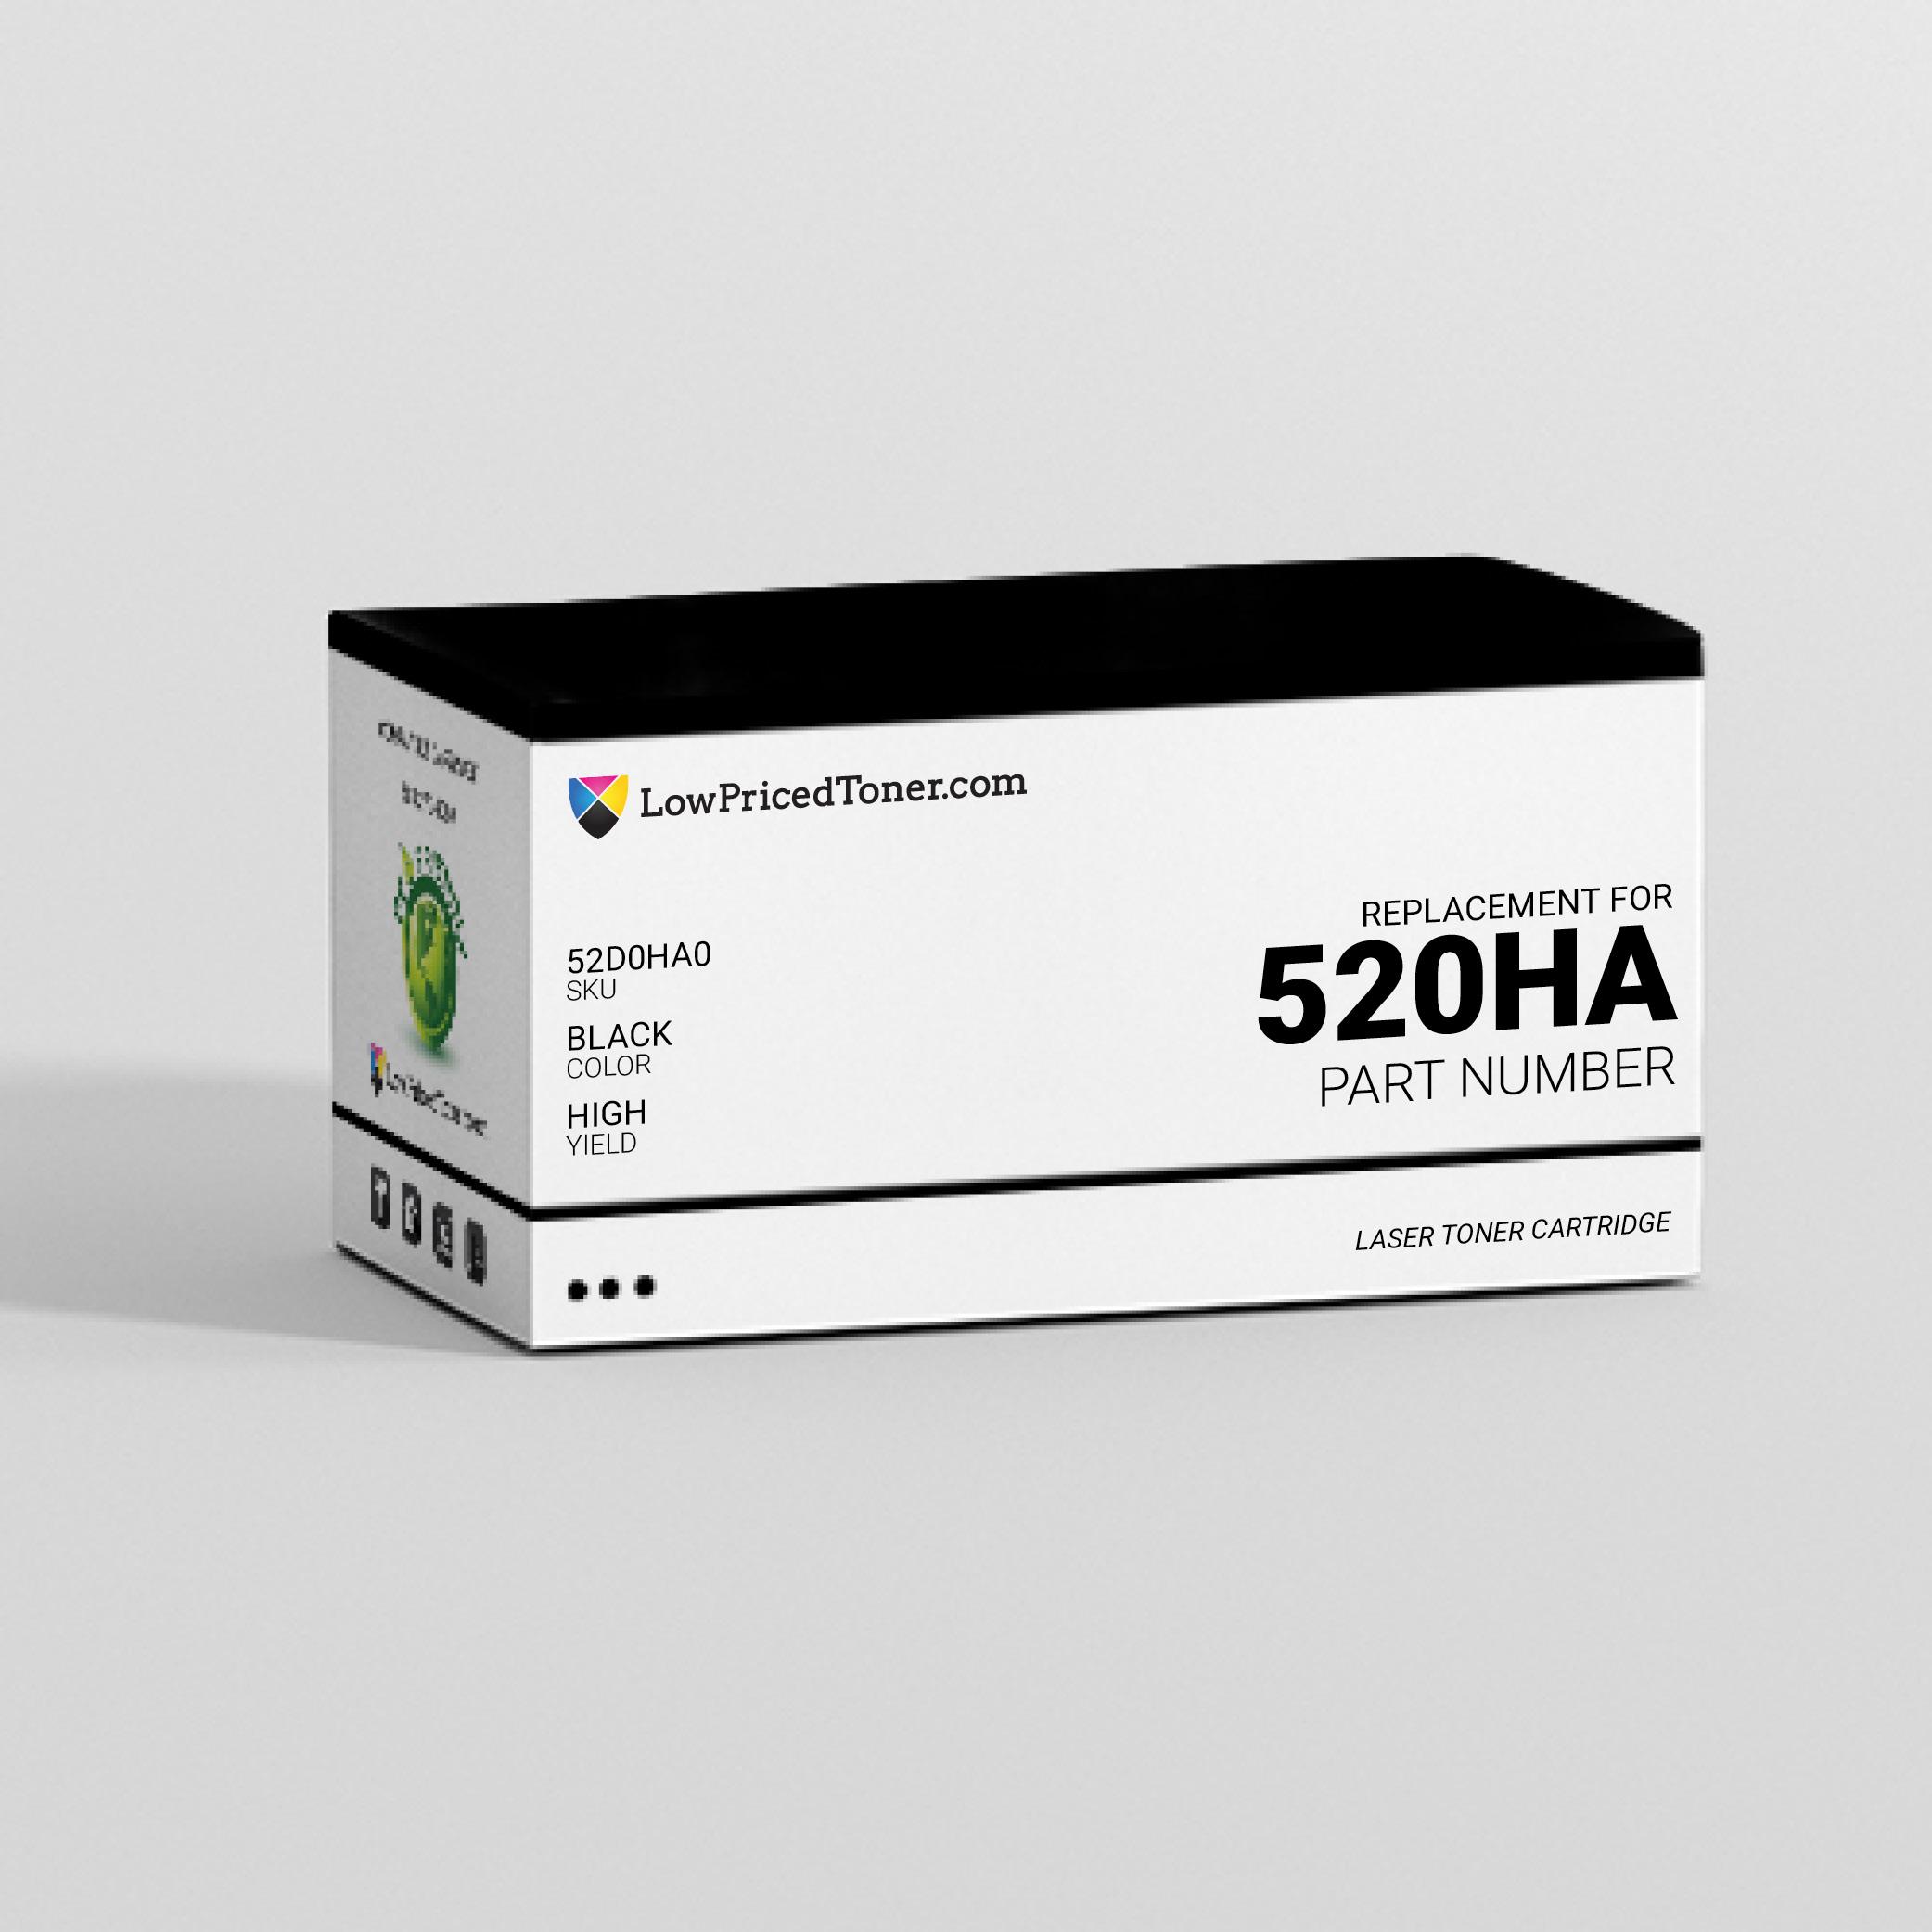 Lexmark 52D0HA0 520HA Remanufactured Black Laser Toner Cartridge High Yield